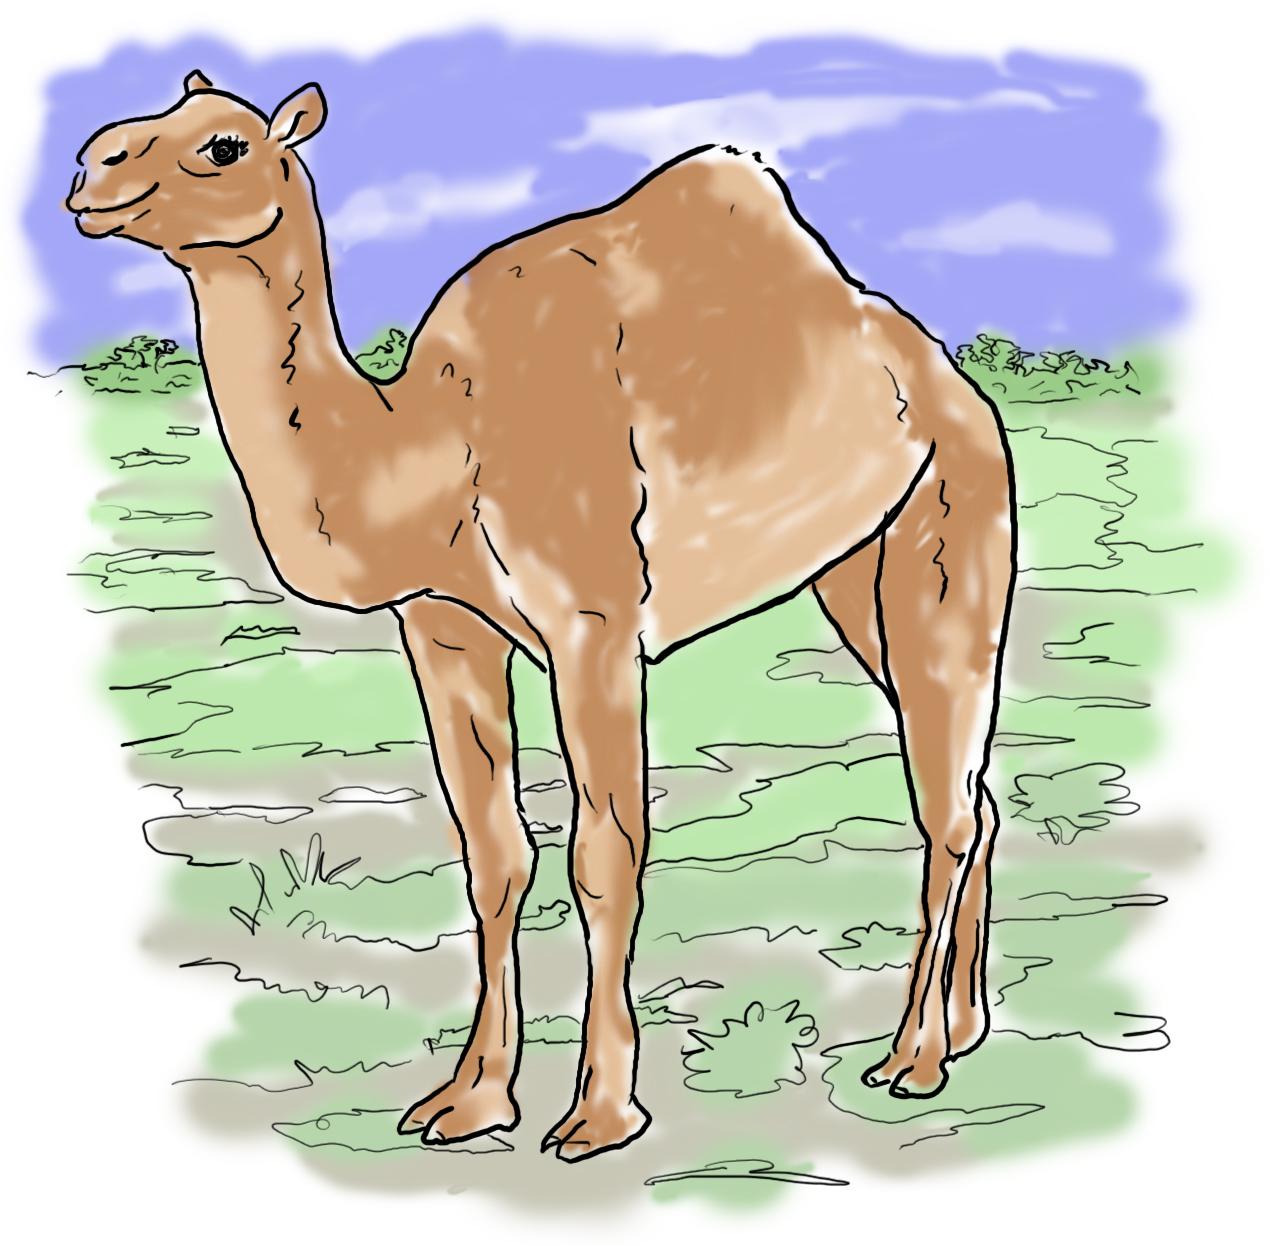 Camel by jennyweatherup